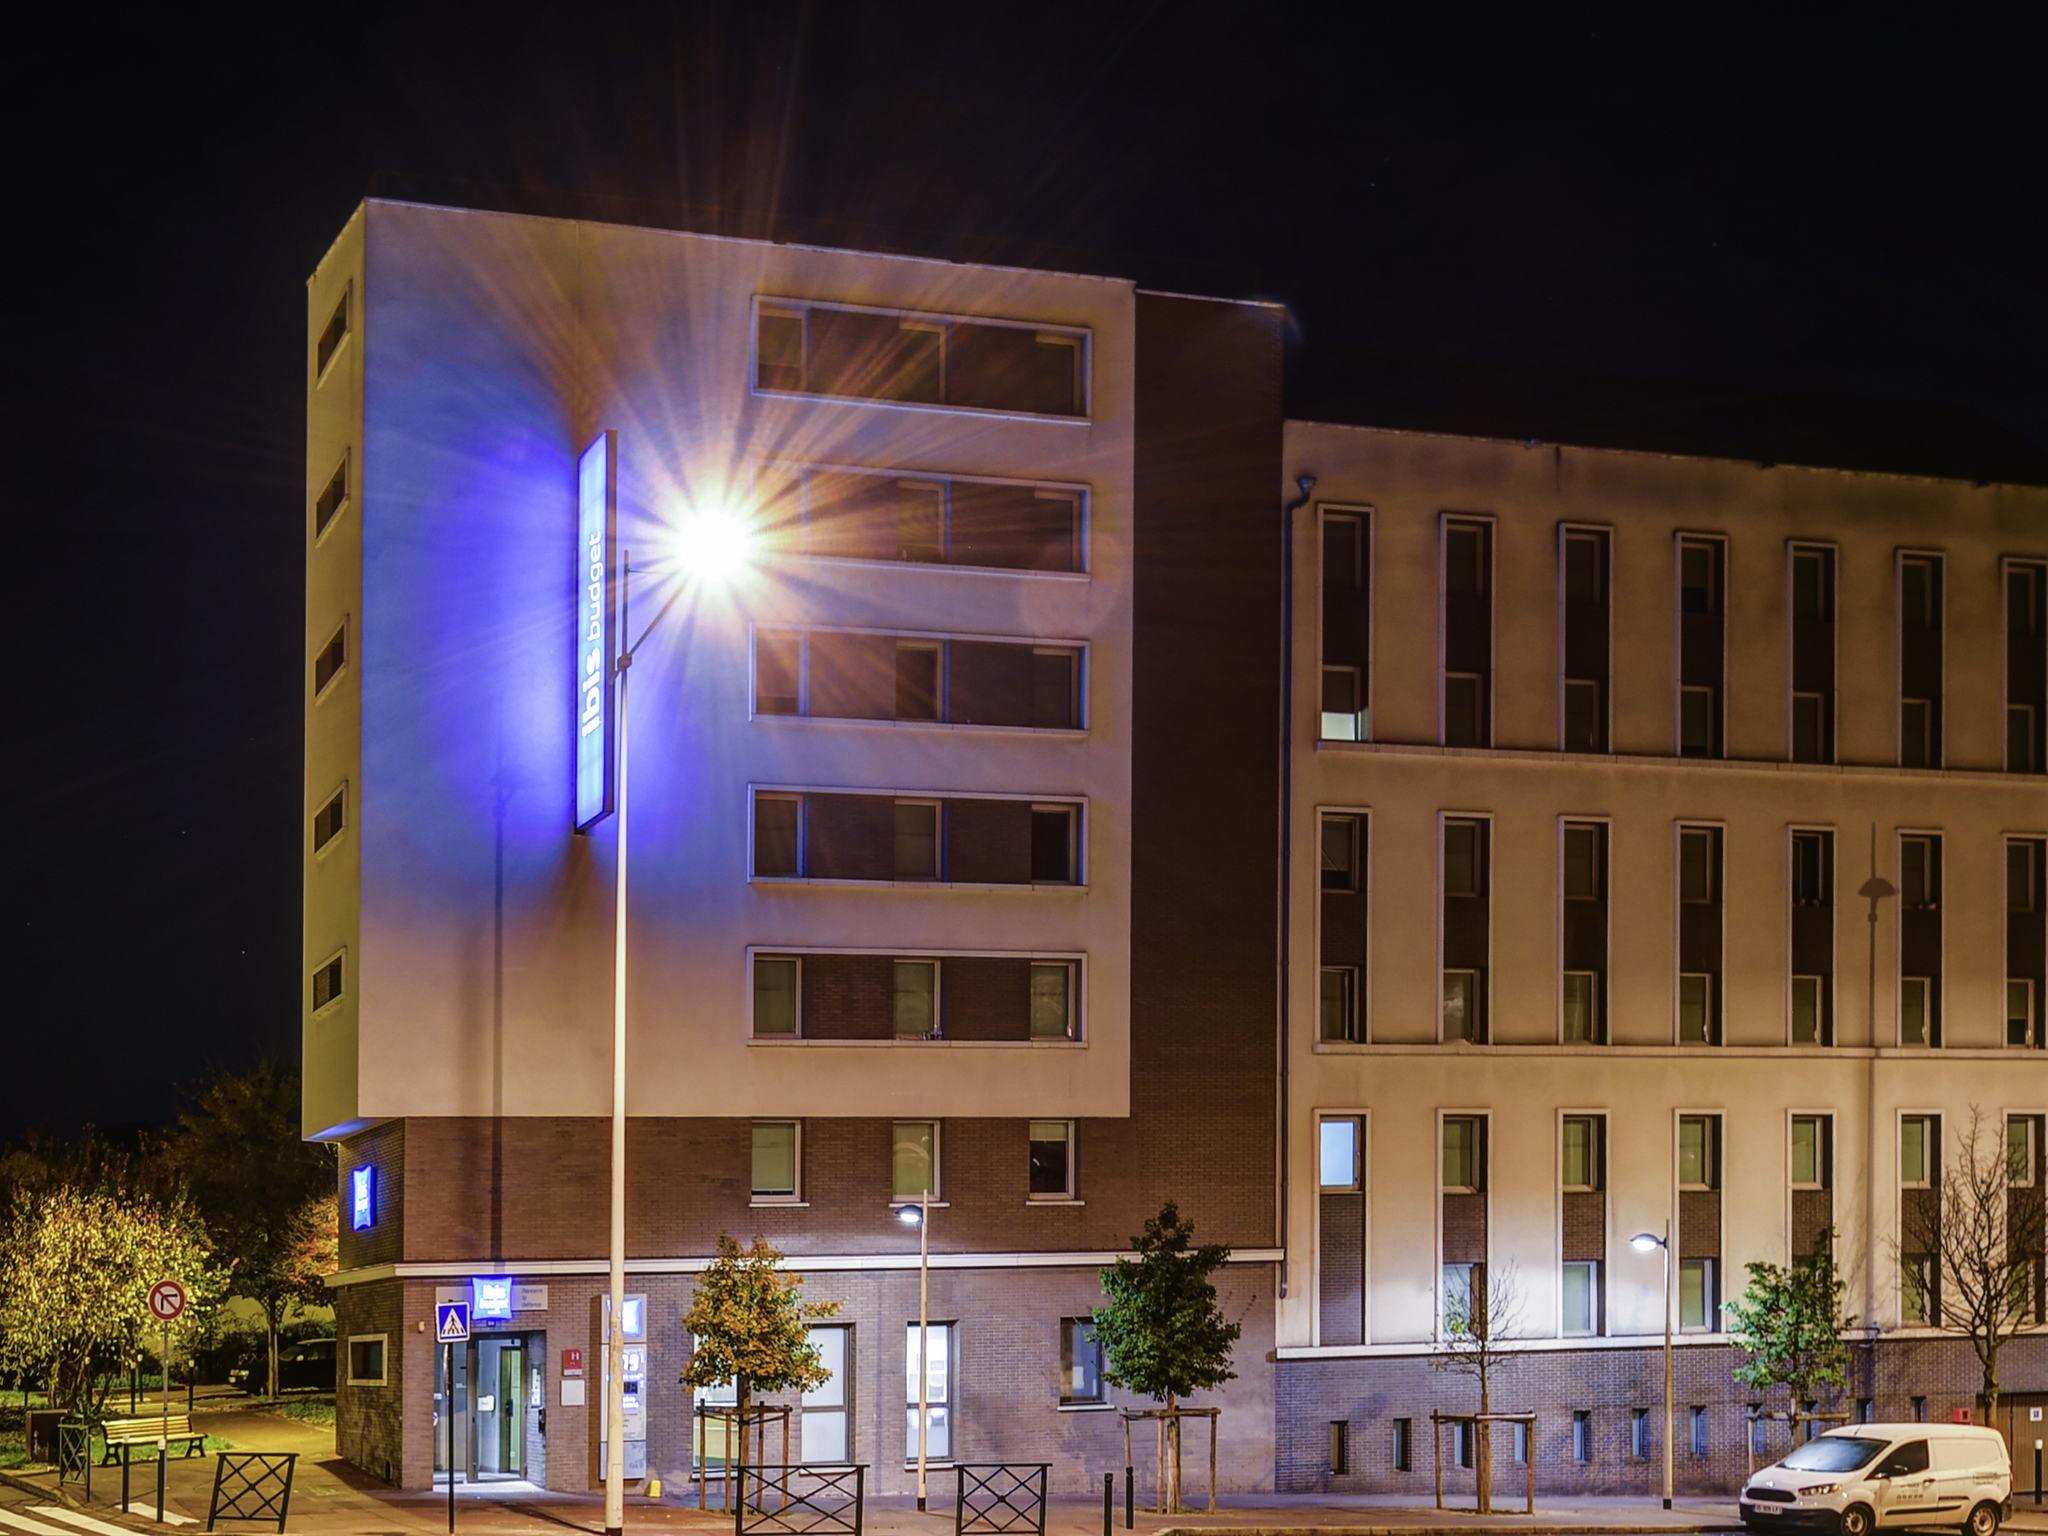 فندق - إيبيس بدجت ibis budget نانتير لاديفانس